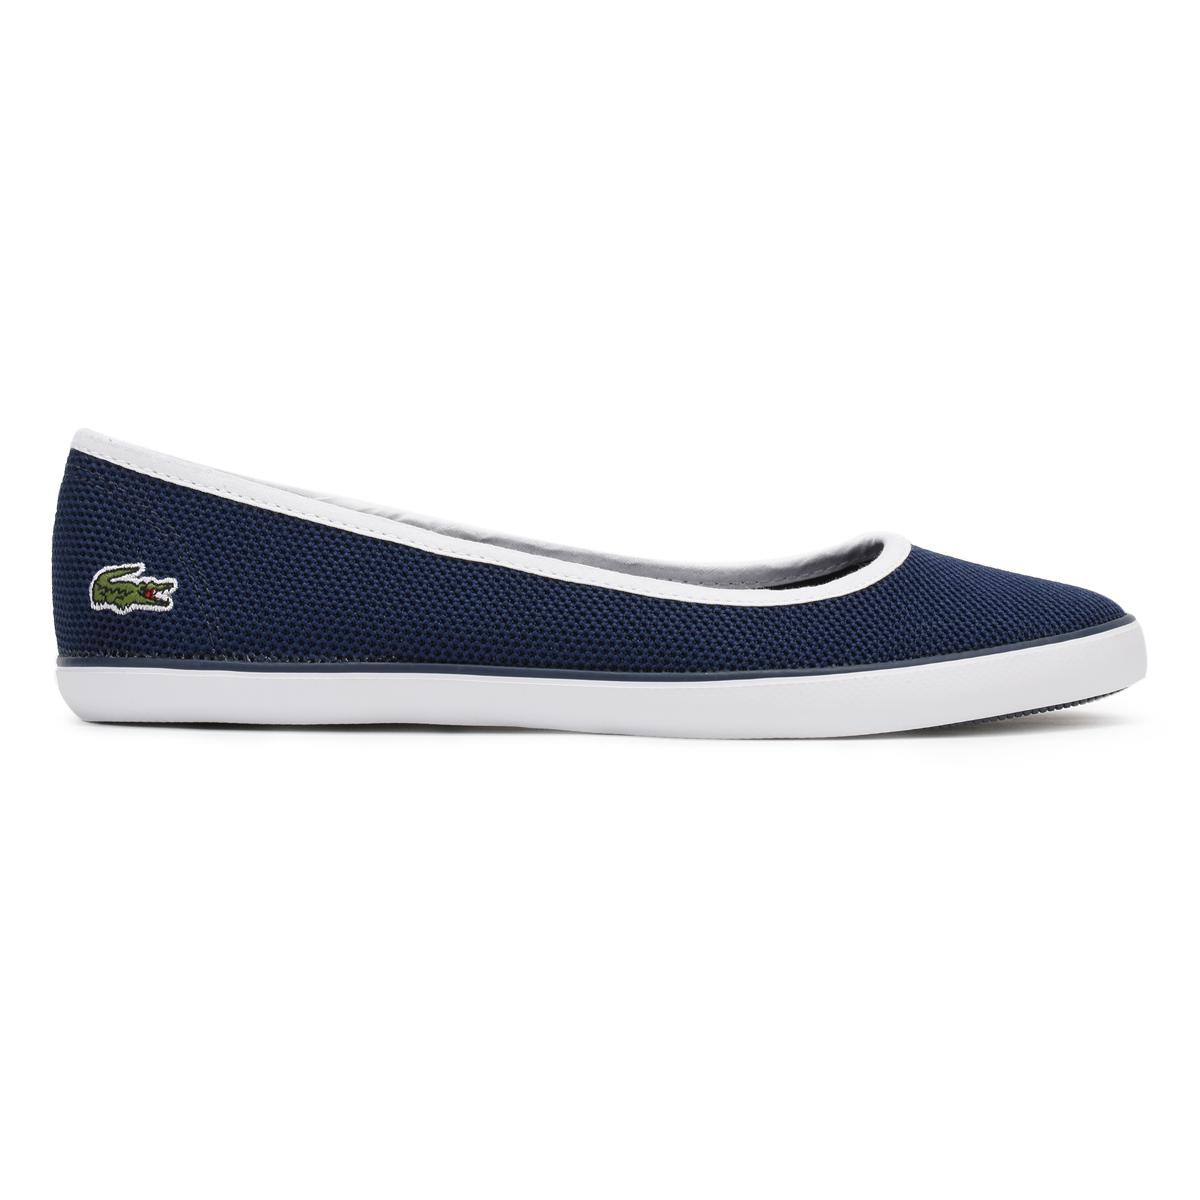 Cheap Lacoste Shoes Ebay